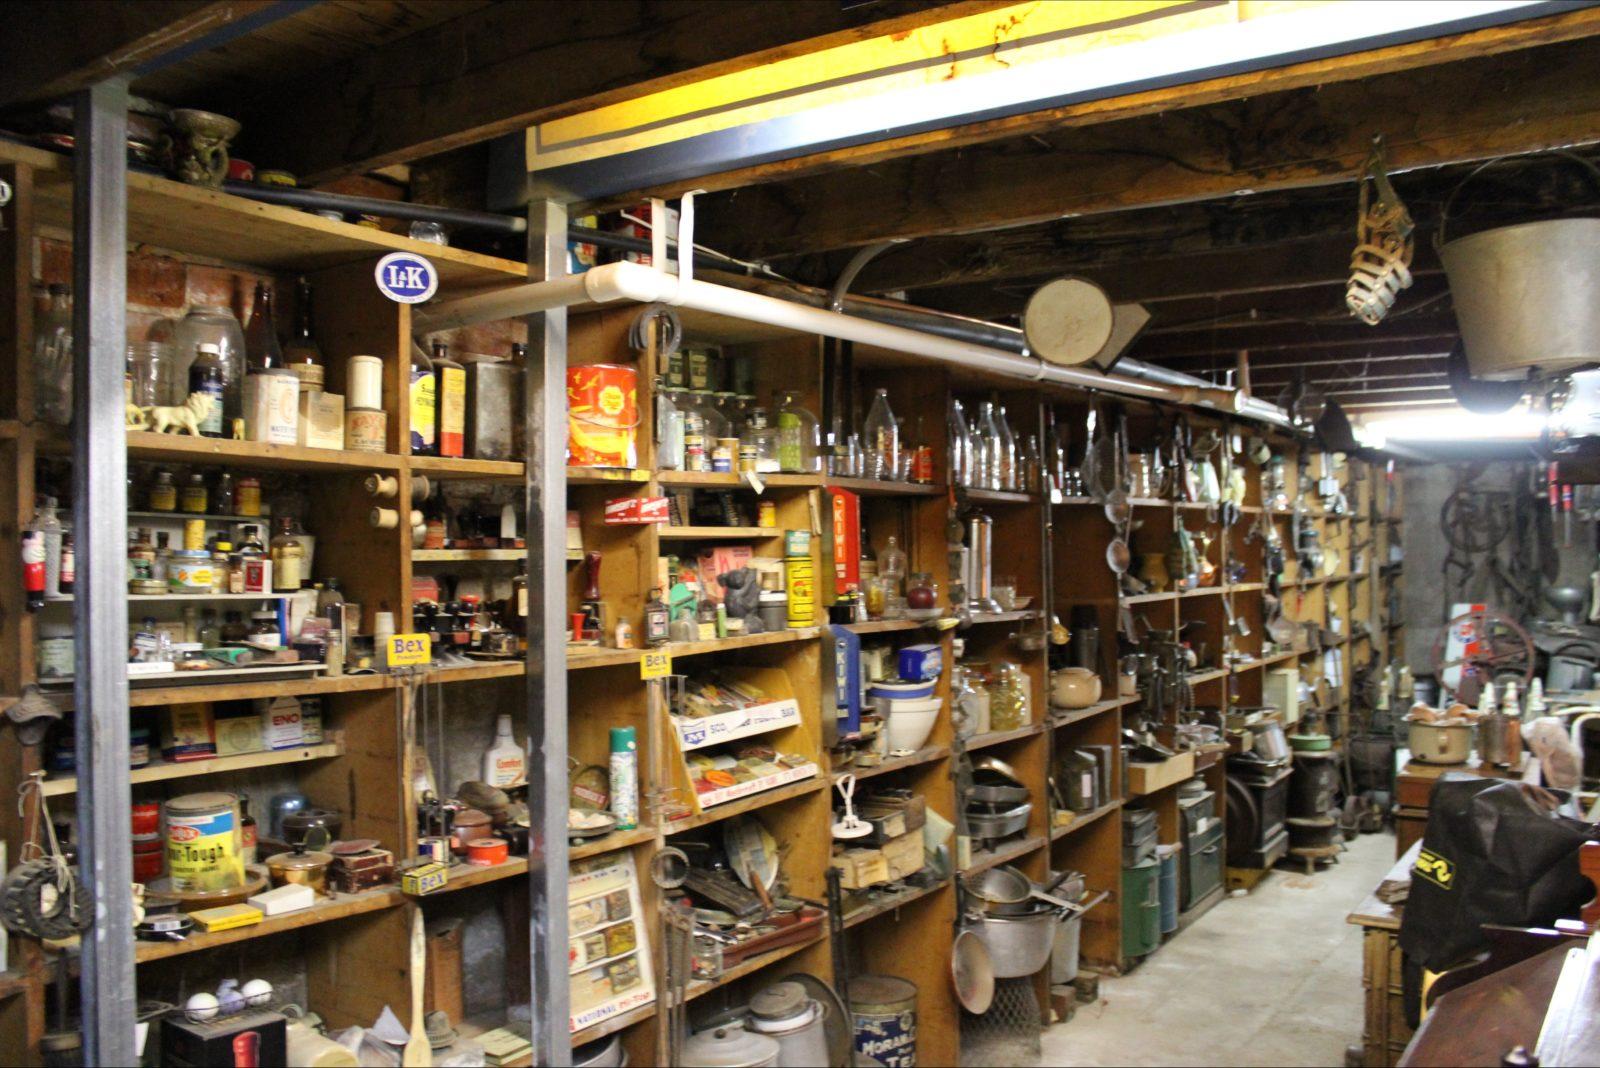 Dale's Mini Museum